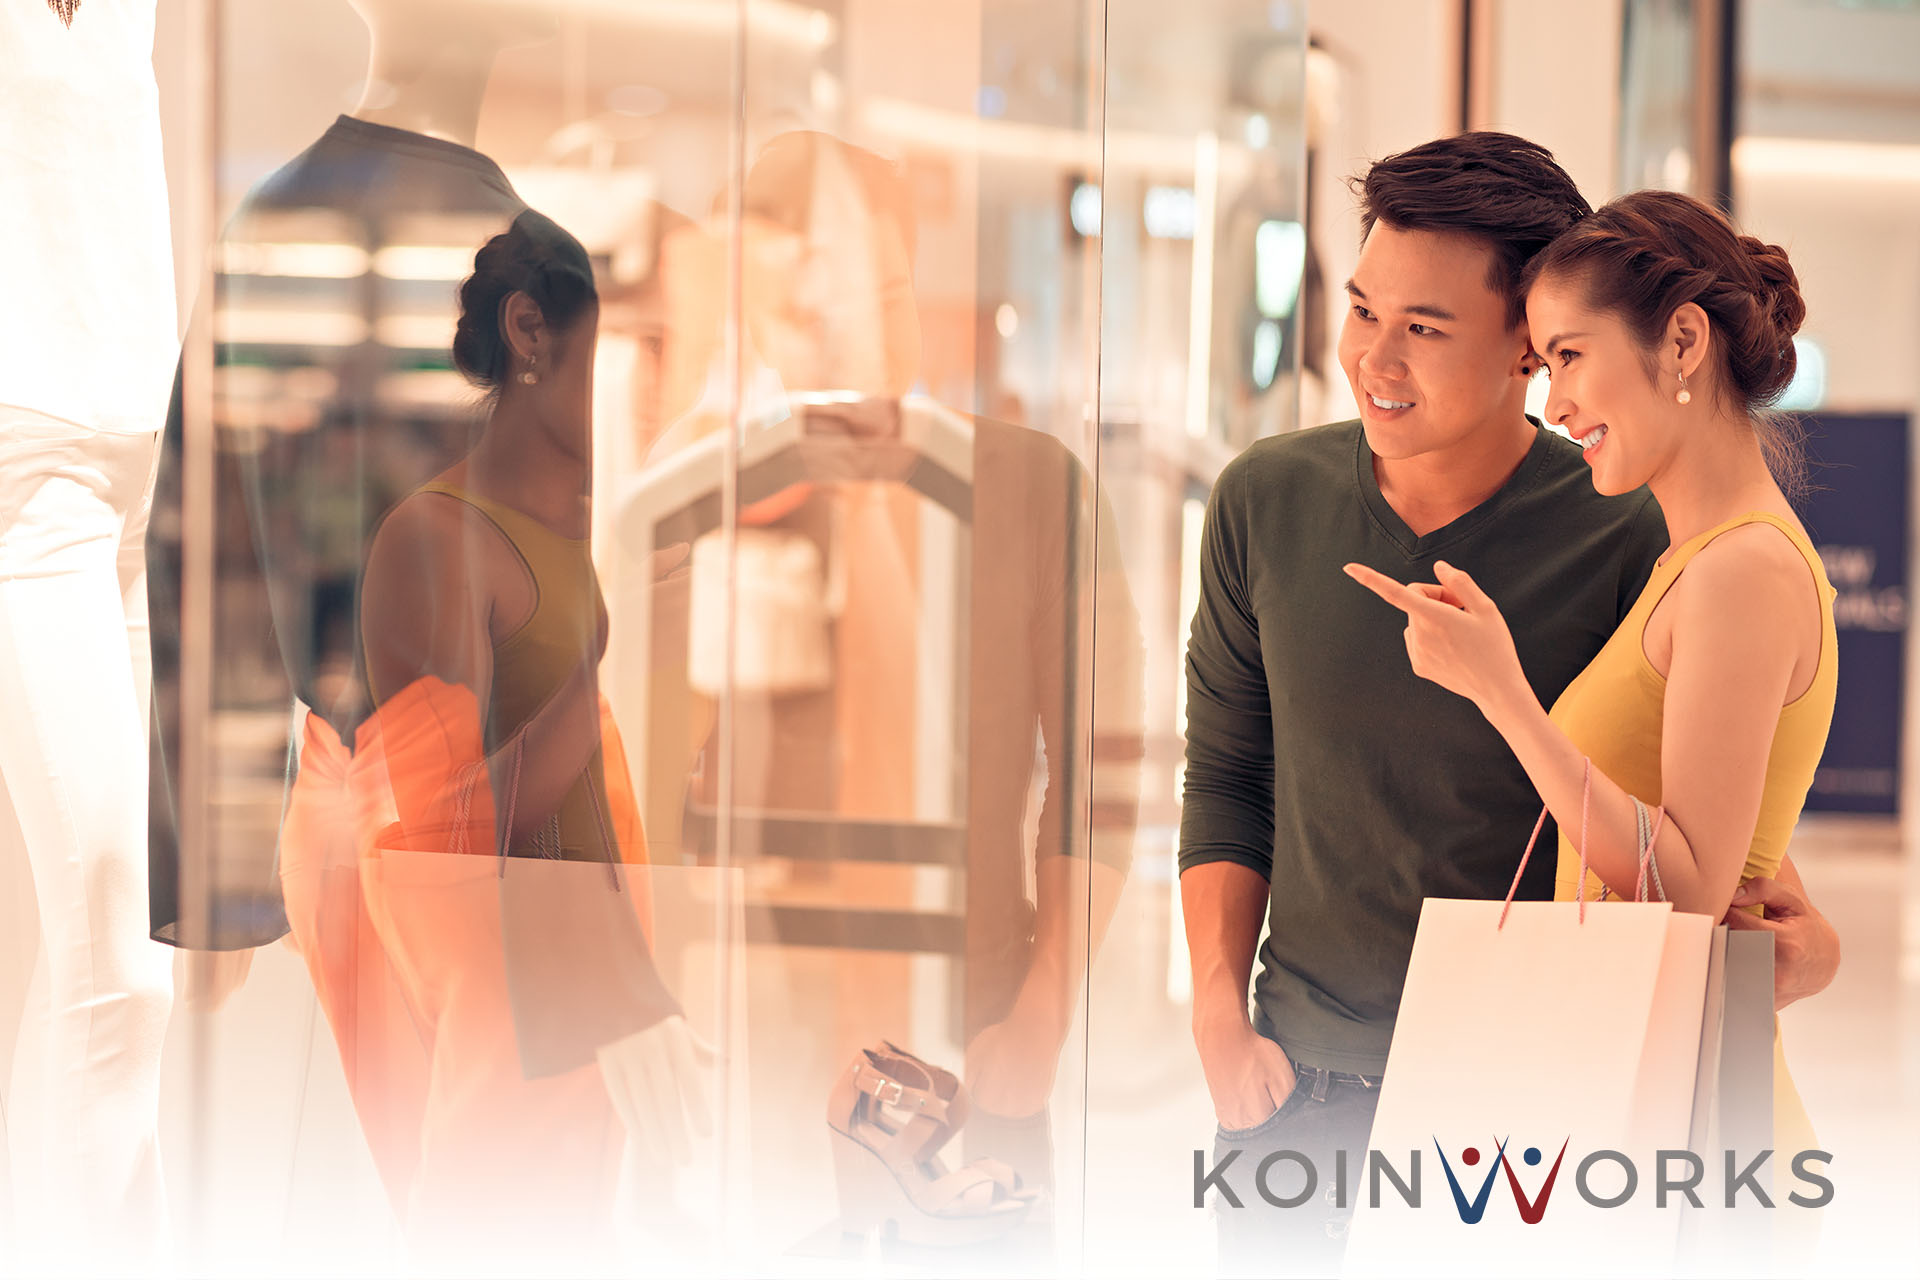 belanja pasangan boros - 4 Langkah Membantu Pasangan Berhenti Boros, Yuk Bantu Si Dia!